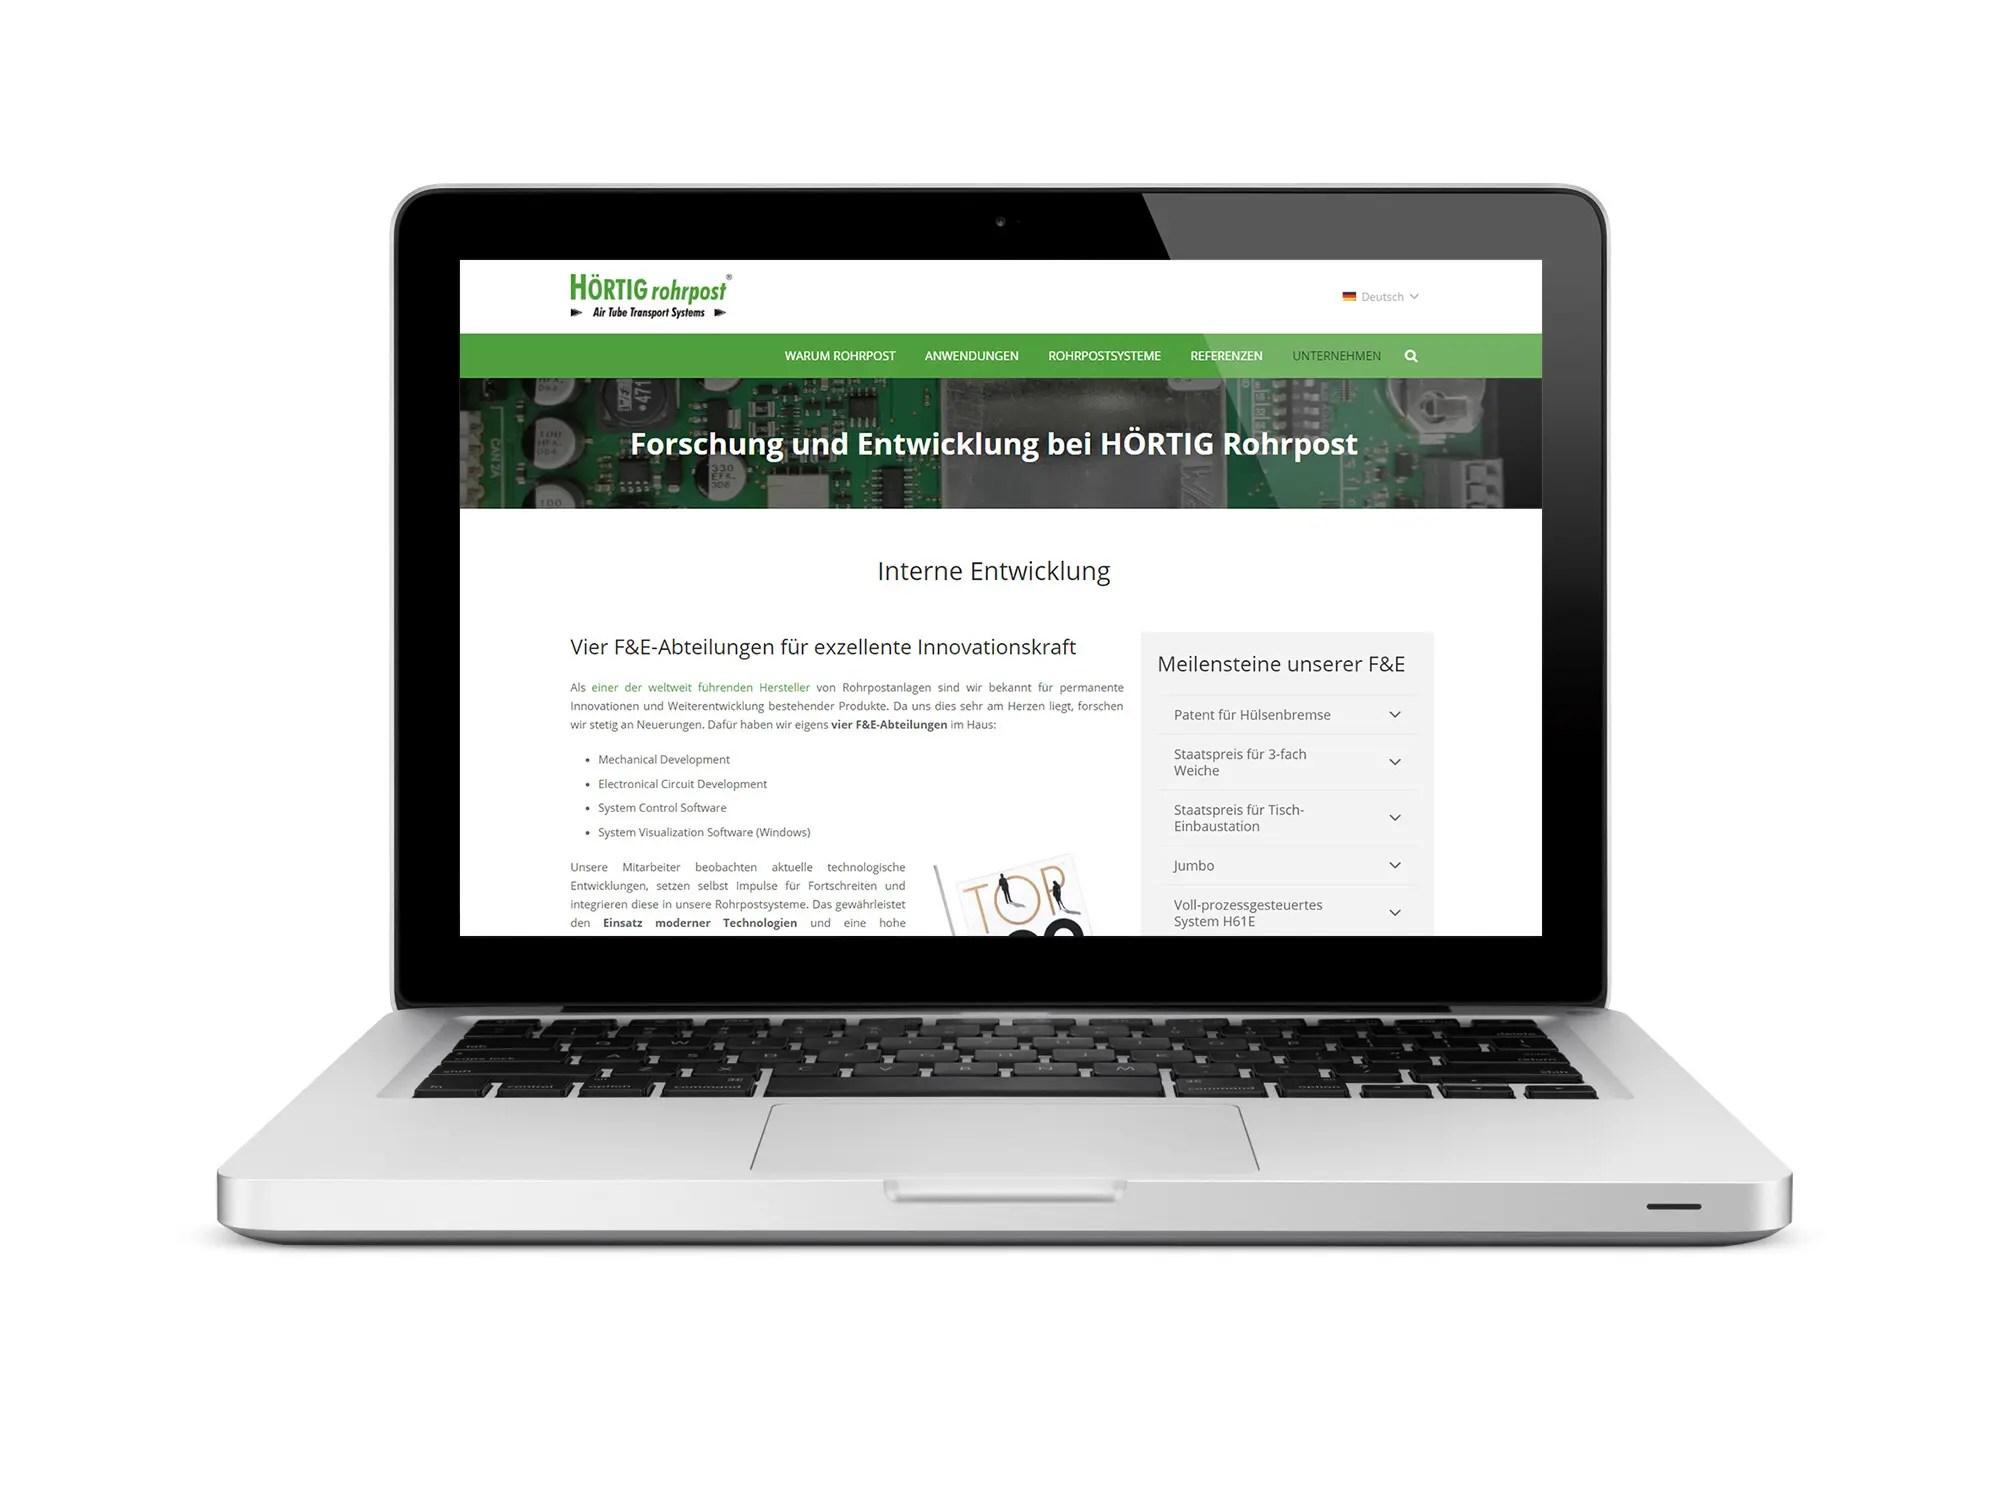 HÖRTIG Rohrpost launcht neue Corporate Website